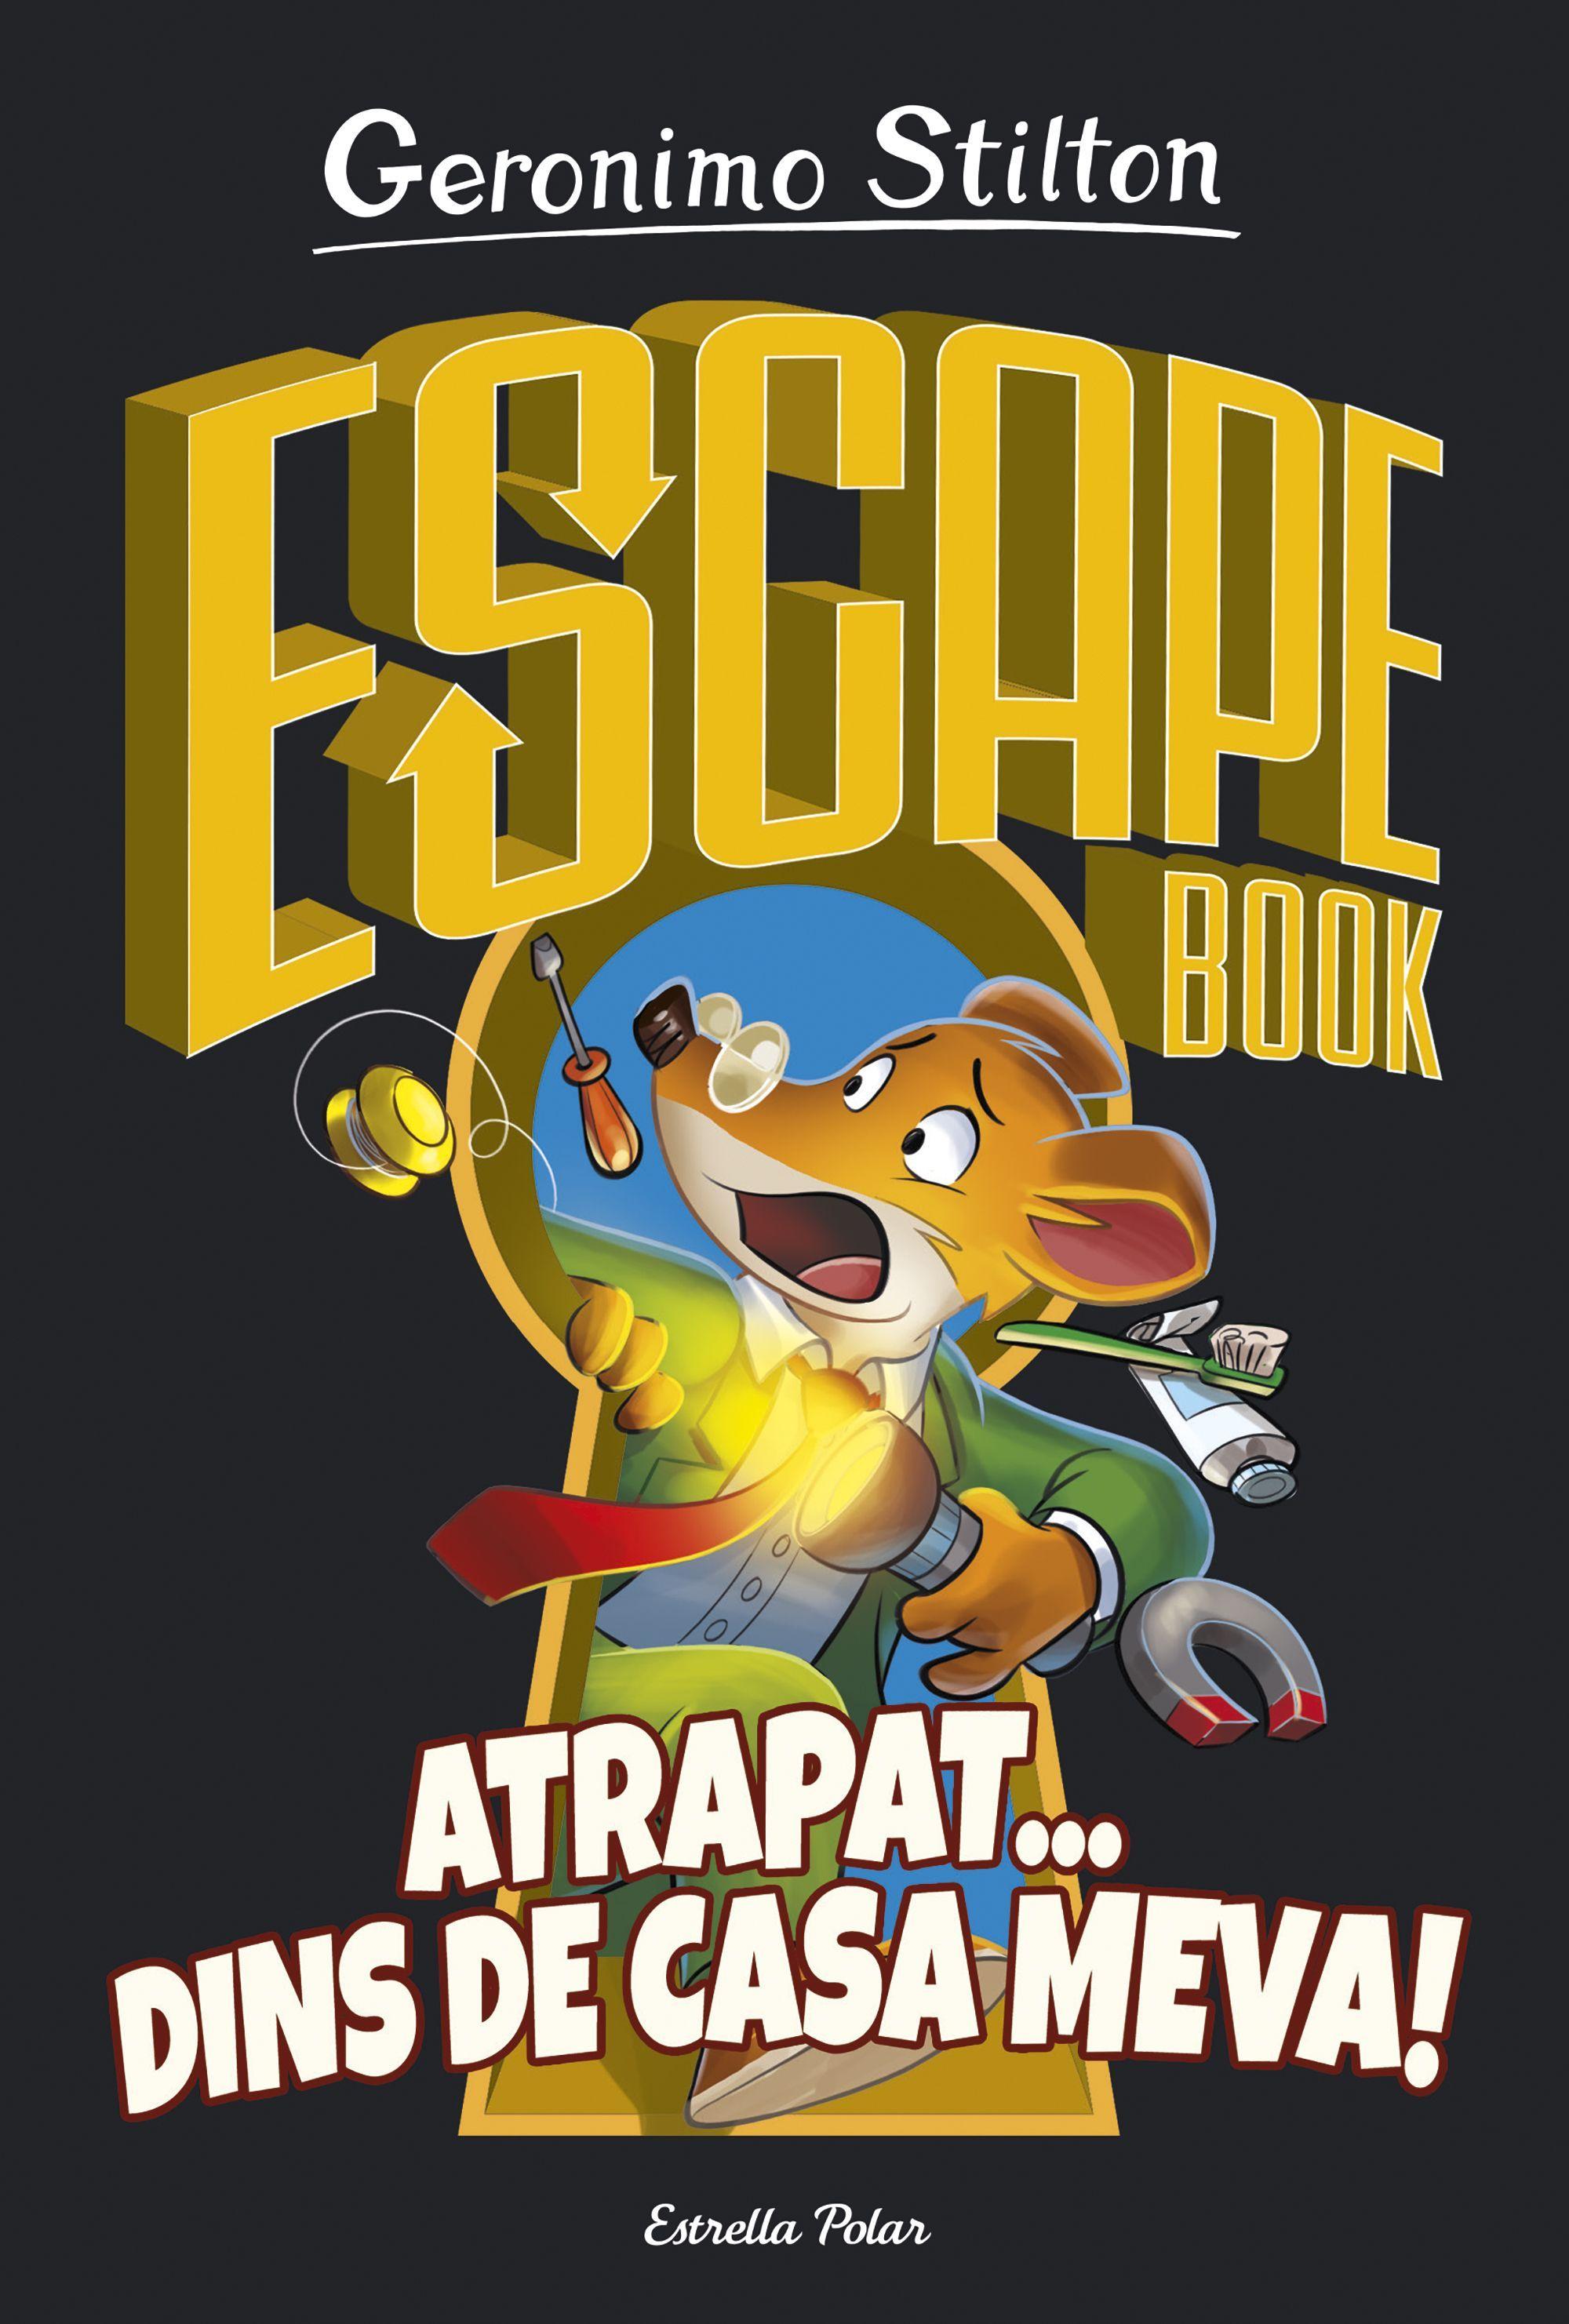 ESCAPE BOOK ATRAPAT DINS DE CASA MEVA